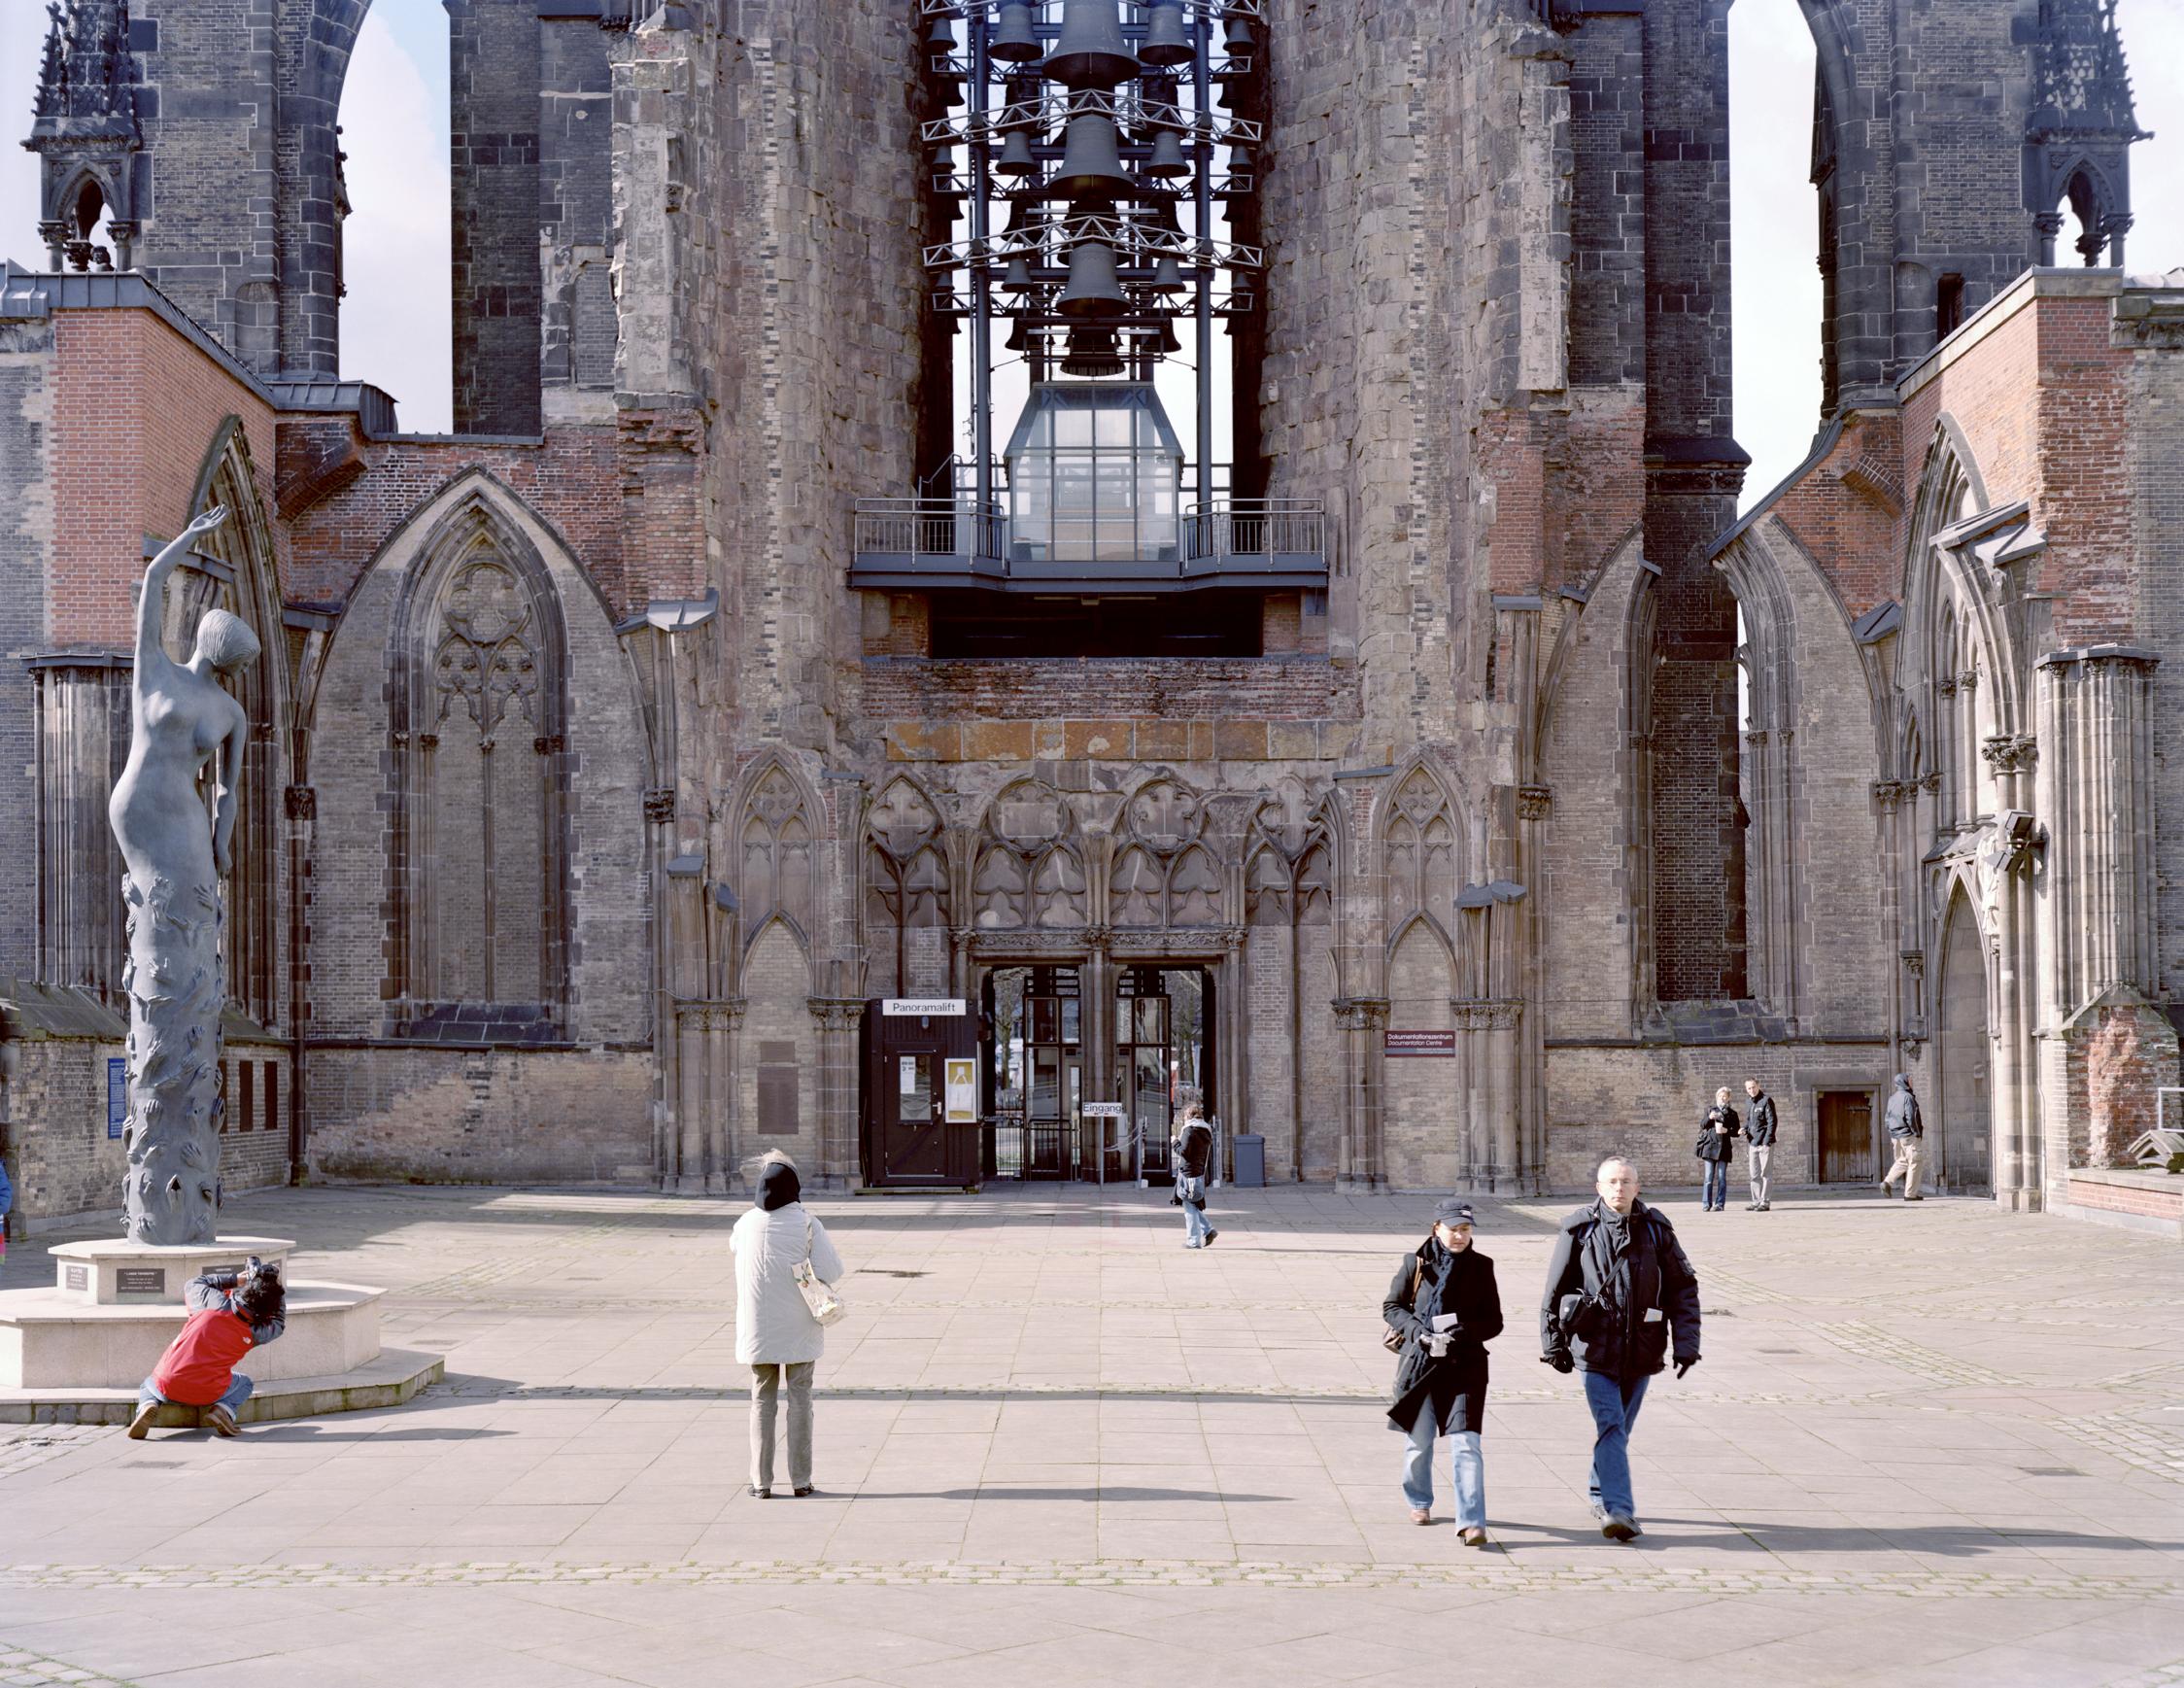 St.-Nikolai-Kirche. Hamburg, Germany